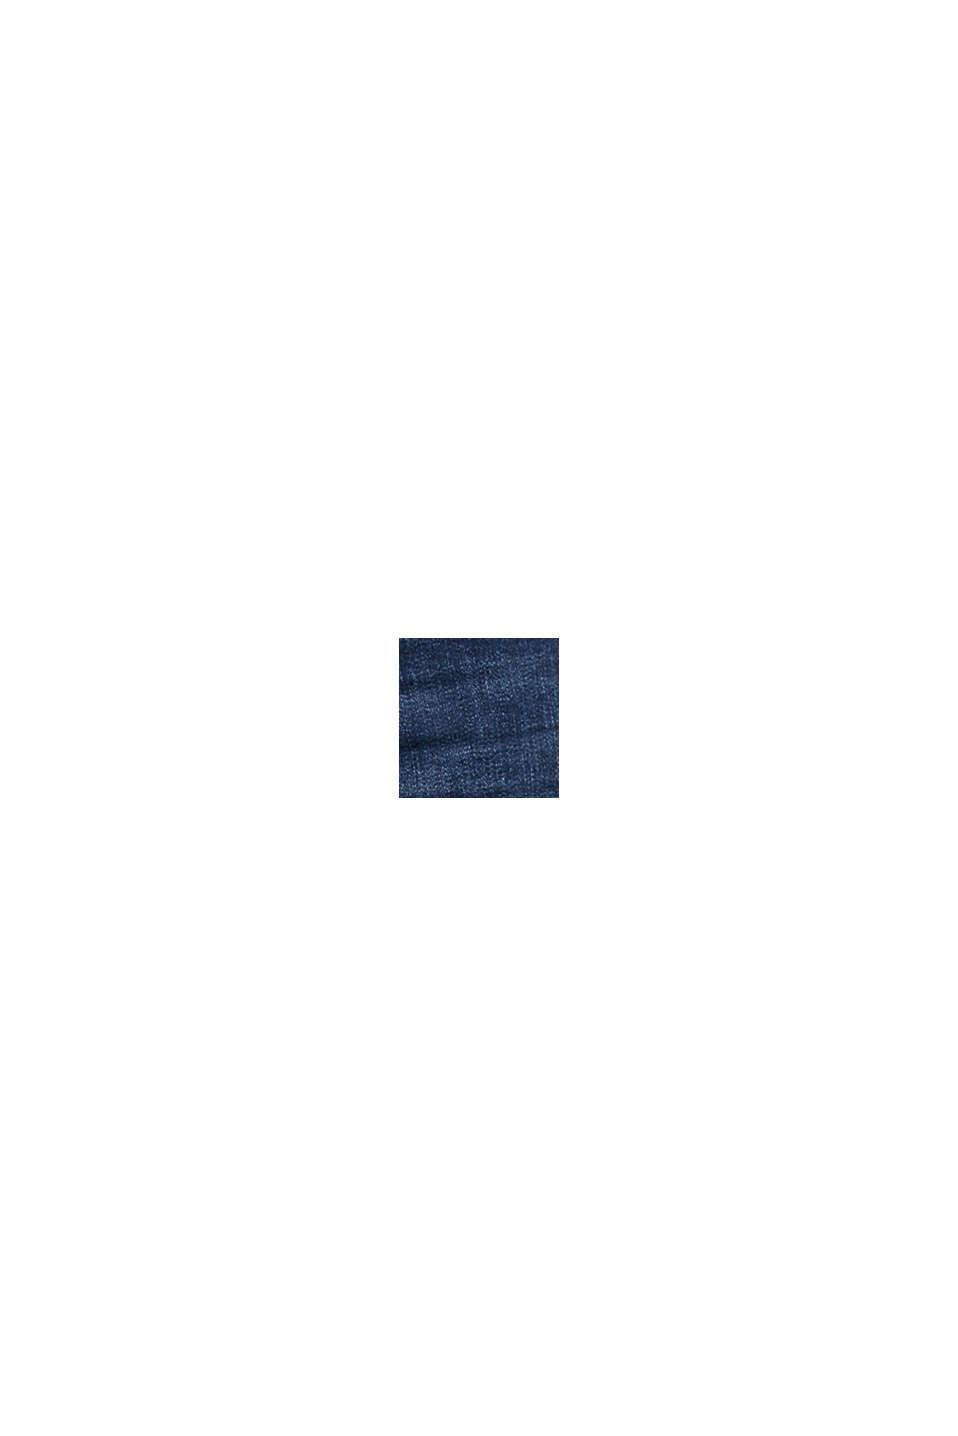 Stretchjeans i basmodell, BLUE DARK WASHED, swatch